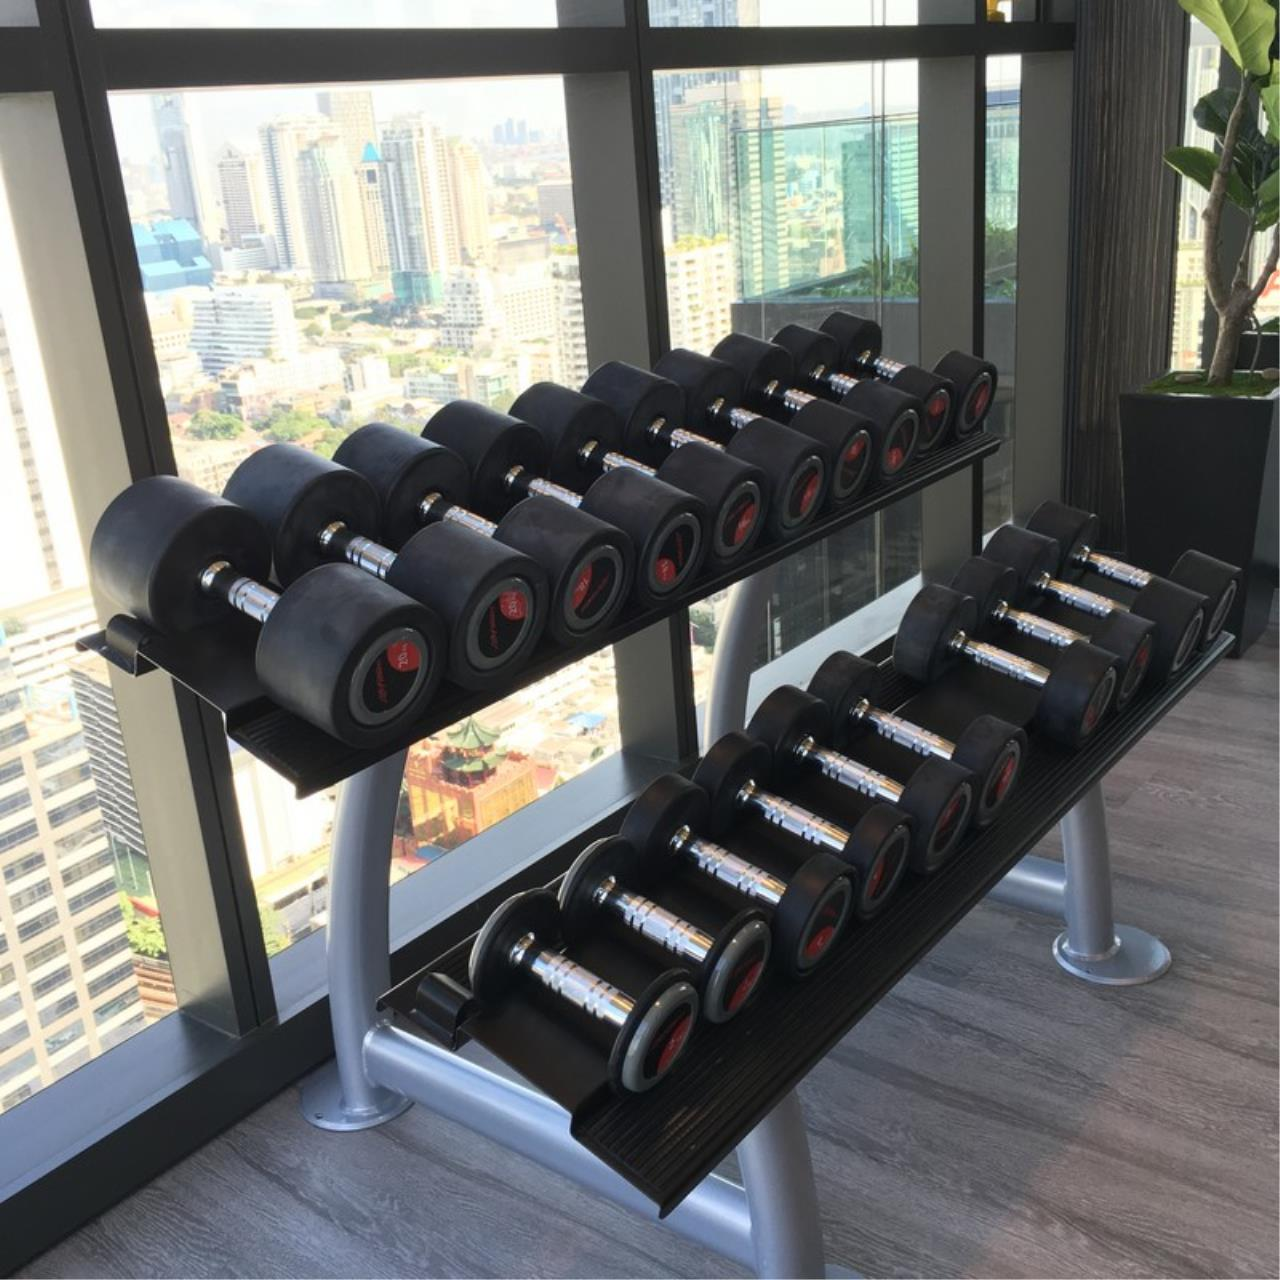 Agent - Chonticha Agency's Condo for sales ASHTON SILOM Corner Room 75.5 sqm 2 bed Chao Phaya River View 8